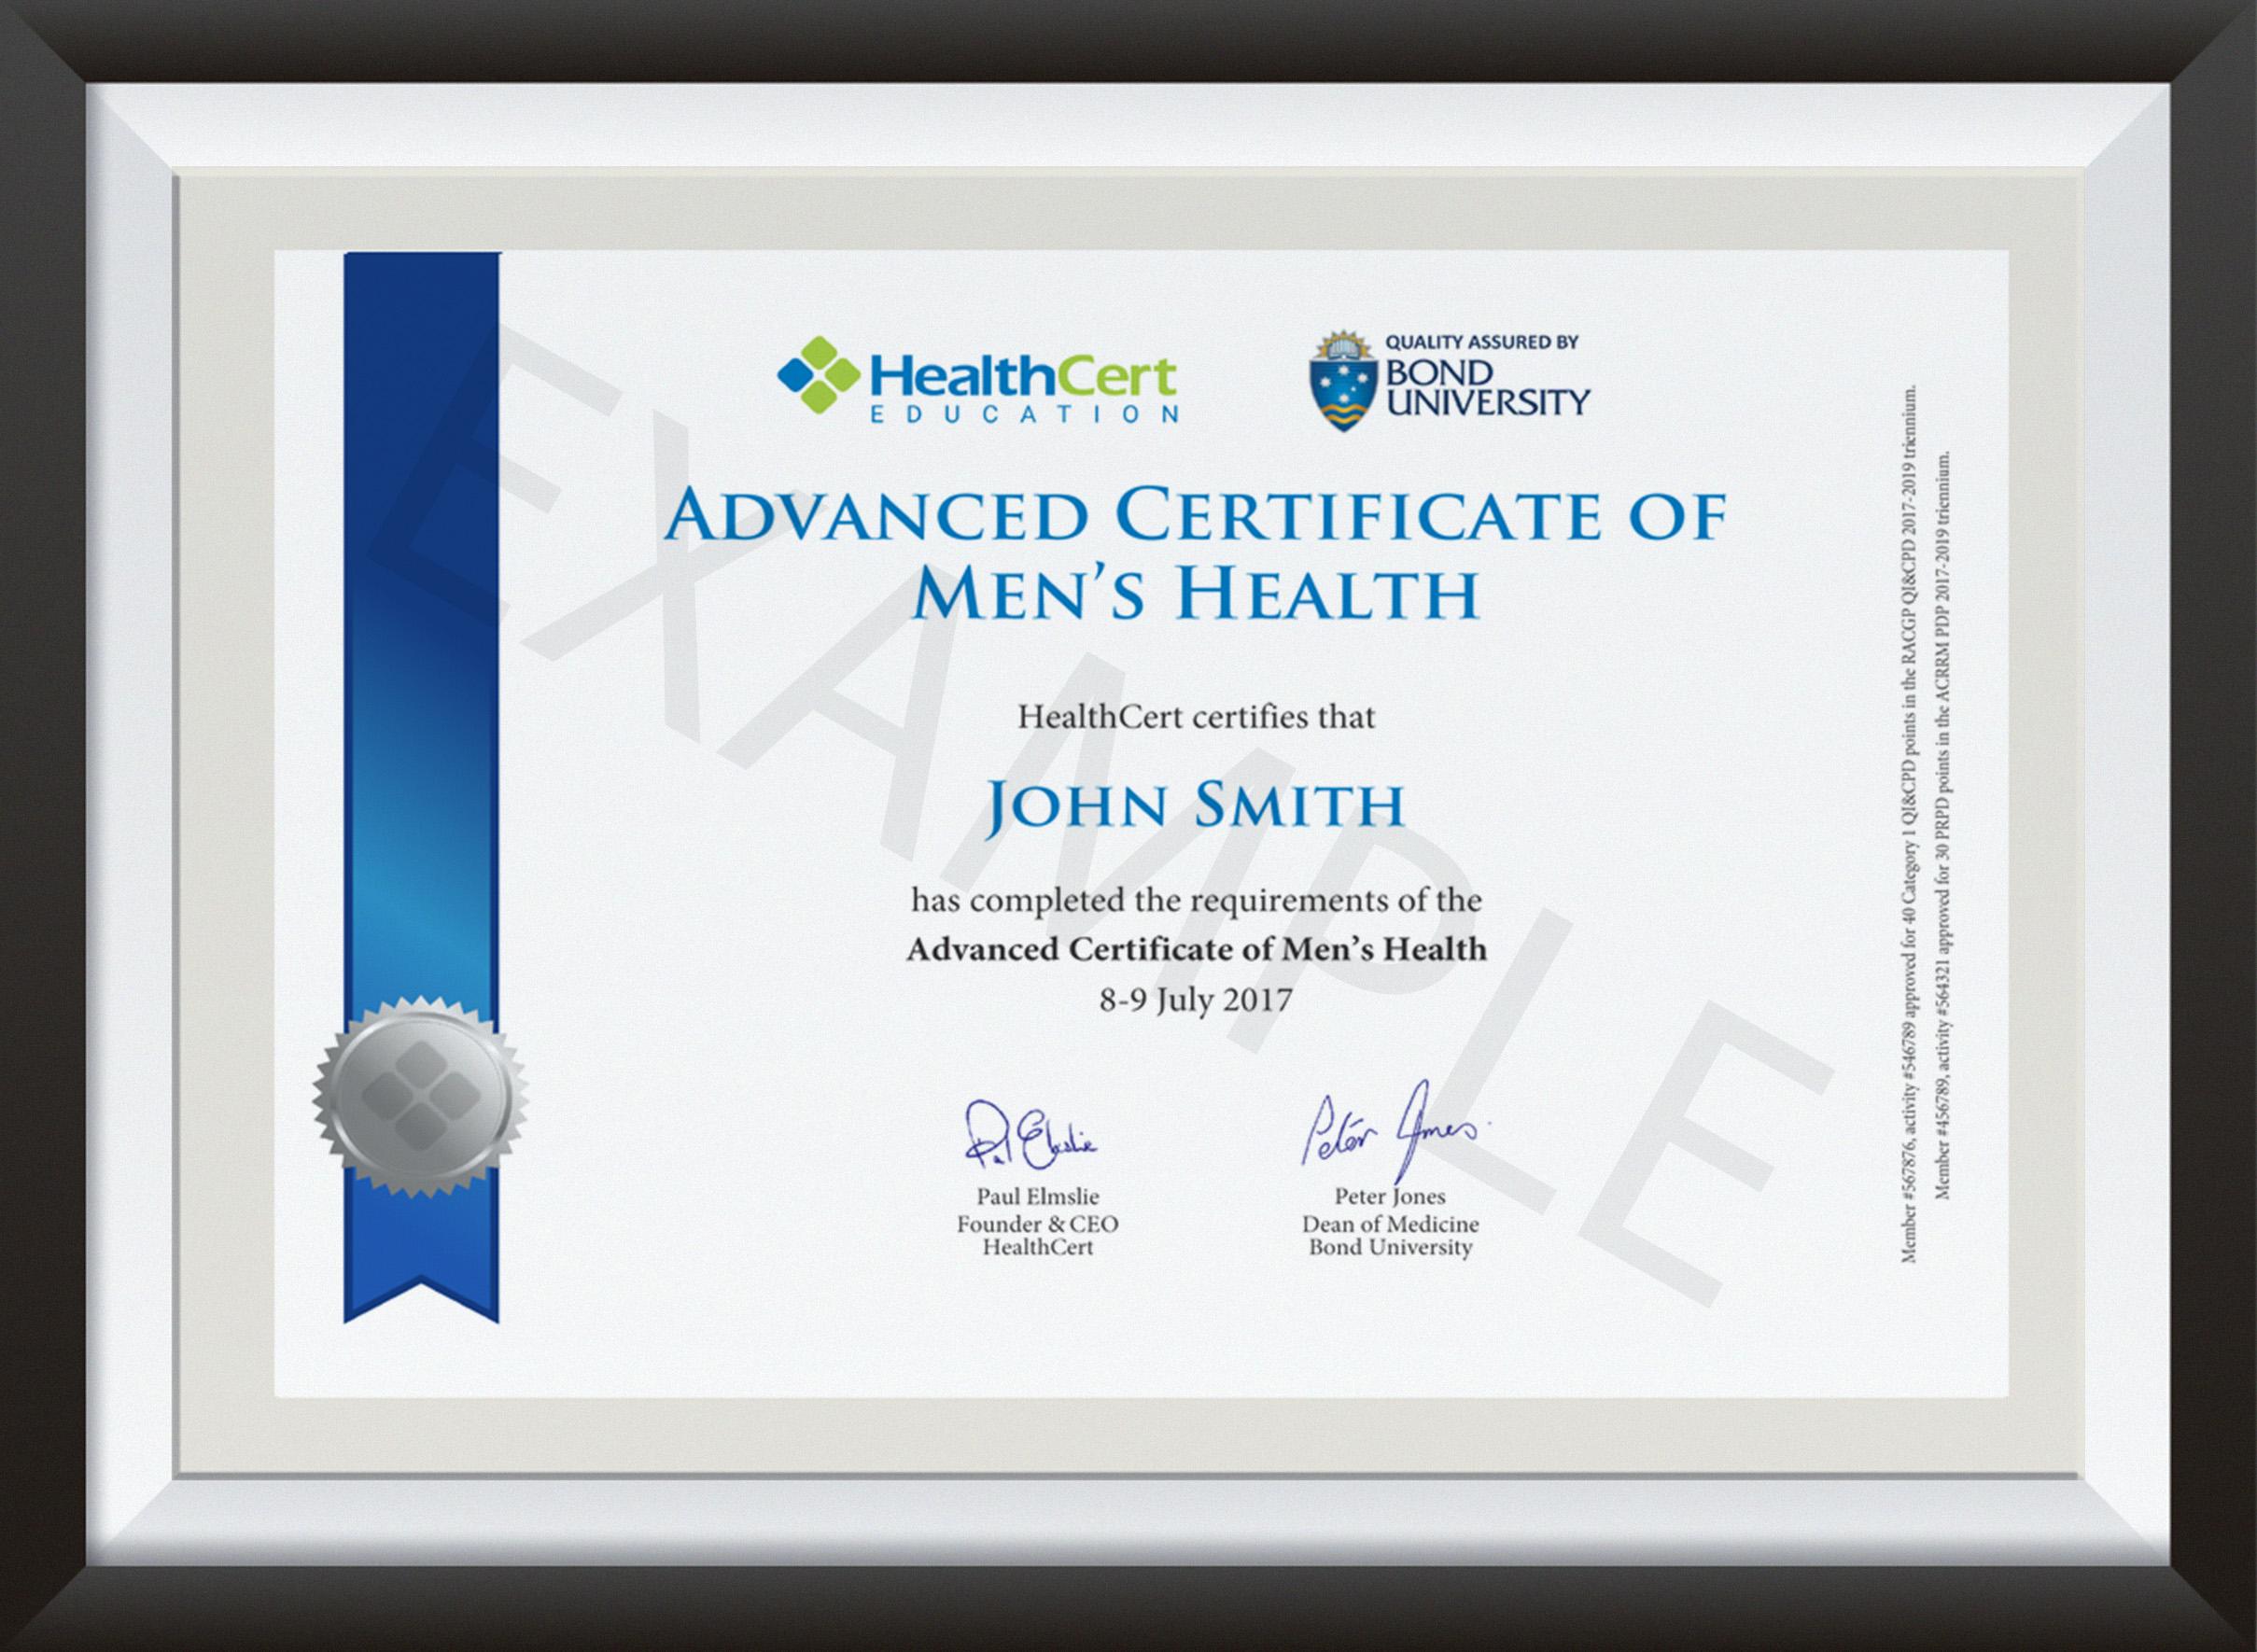 Advanced Certificate of Men's Health